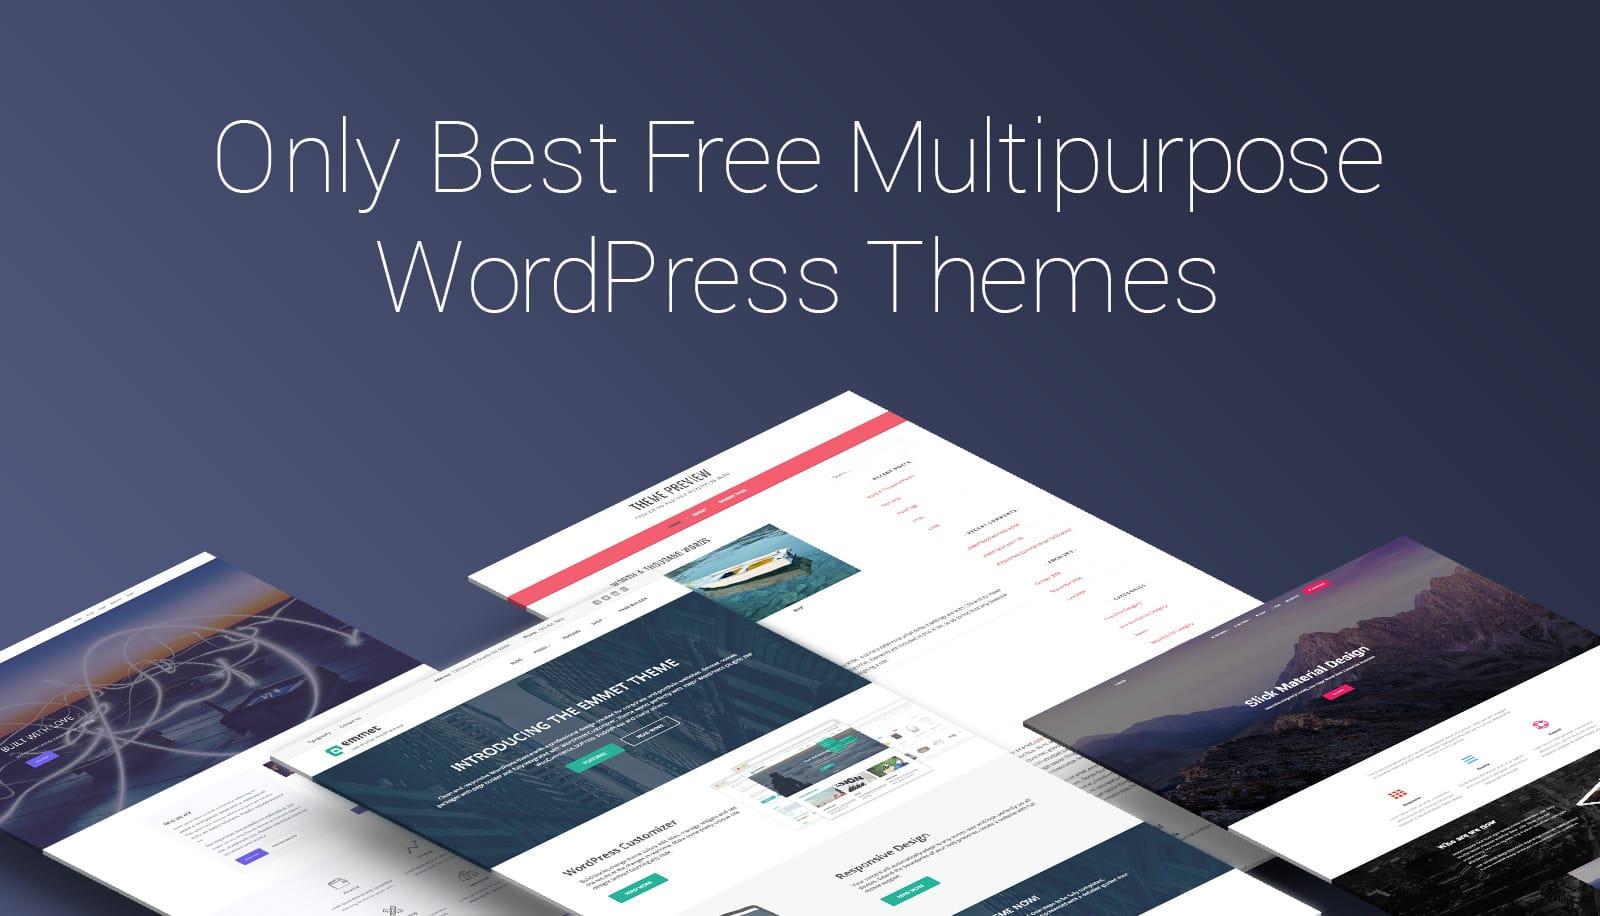 20+ Best Free Multipurpose WordPress Themes 2018 - MotoPress